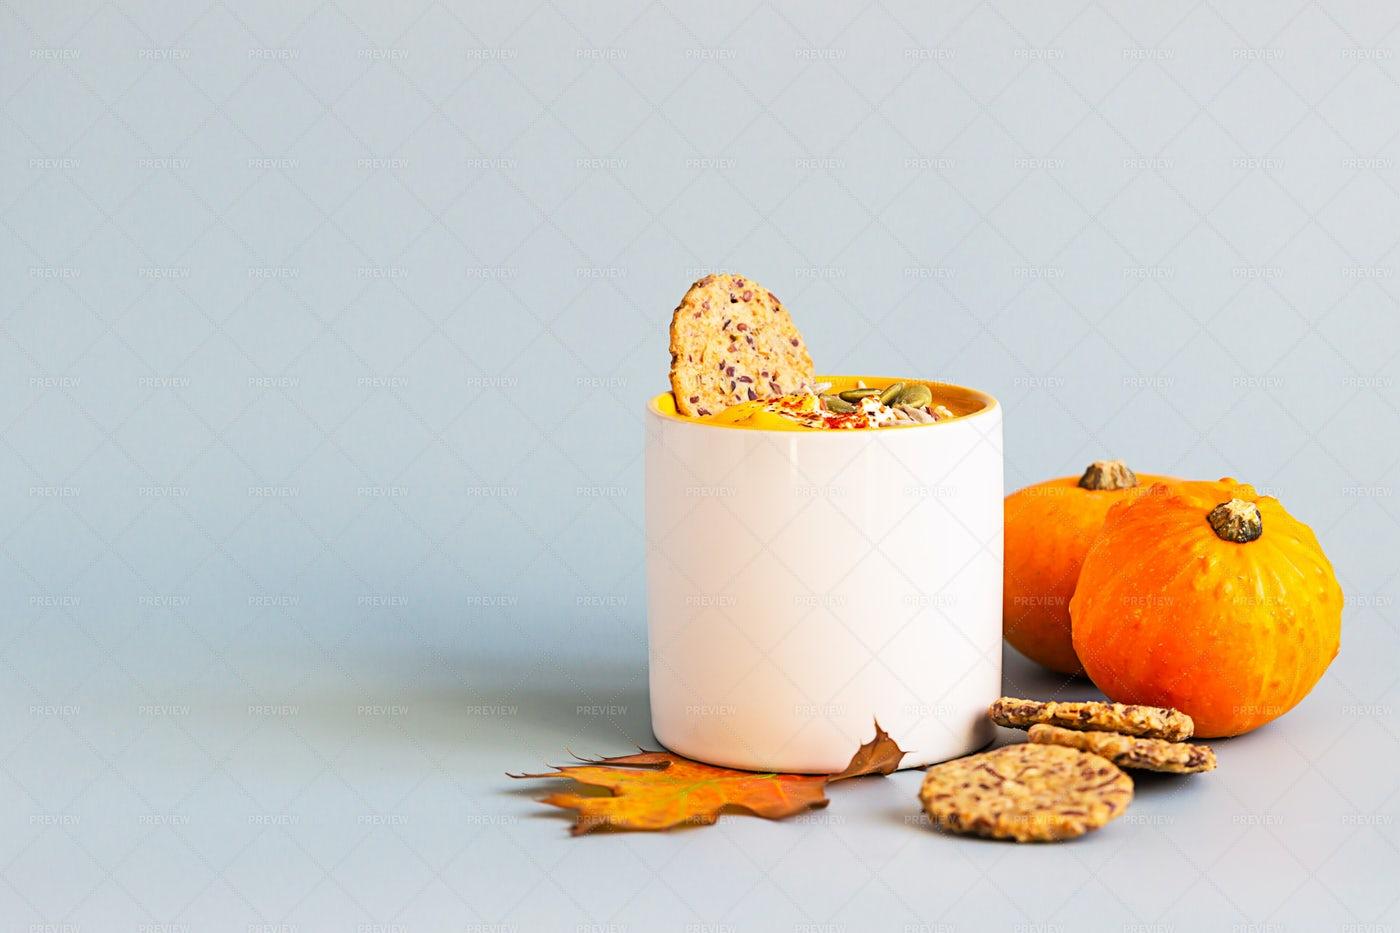 Pumpkin Soup In Mug: Stock Photos